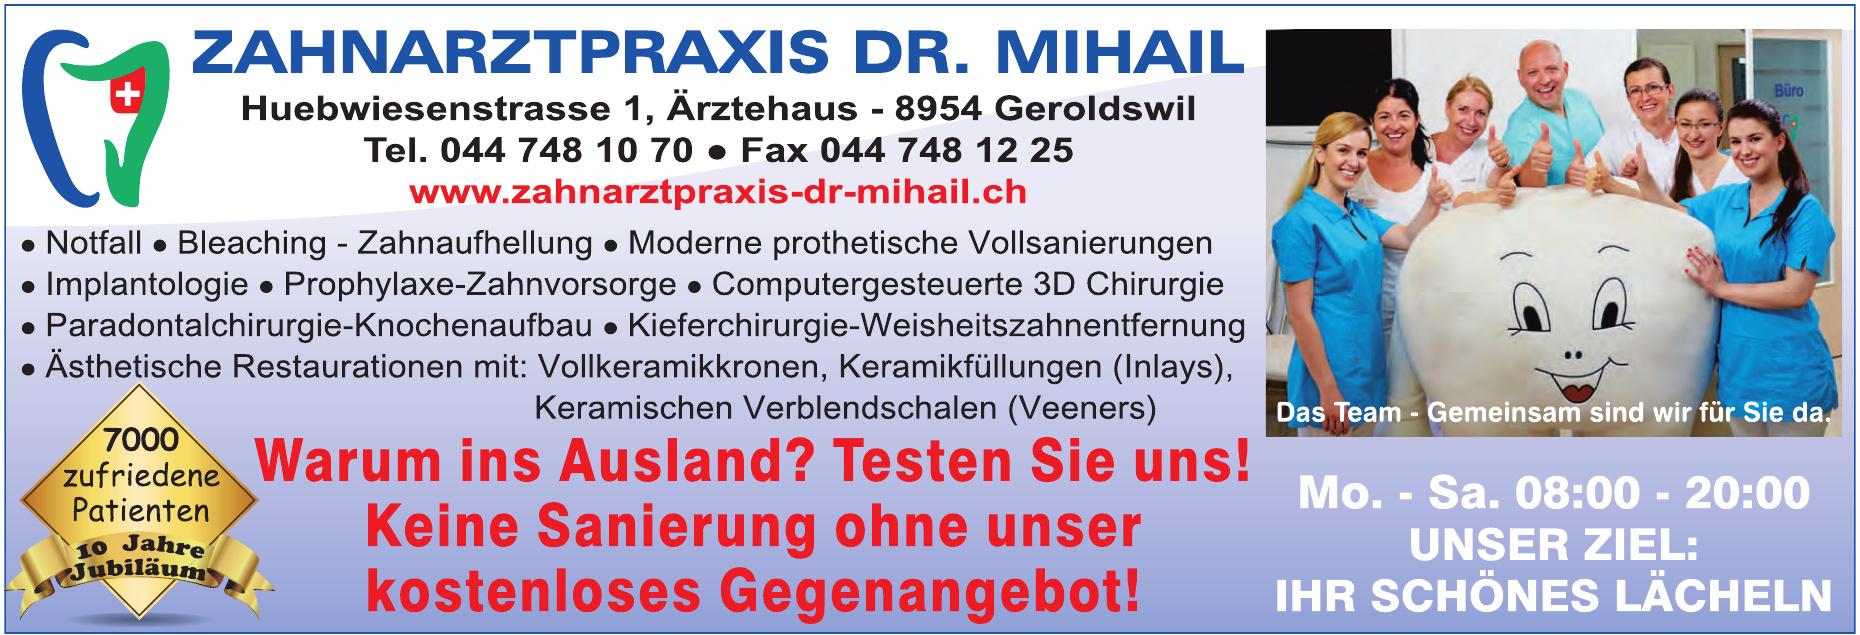 Zahrarztpraxis Dr. Mihail